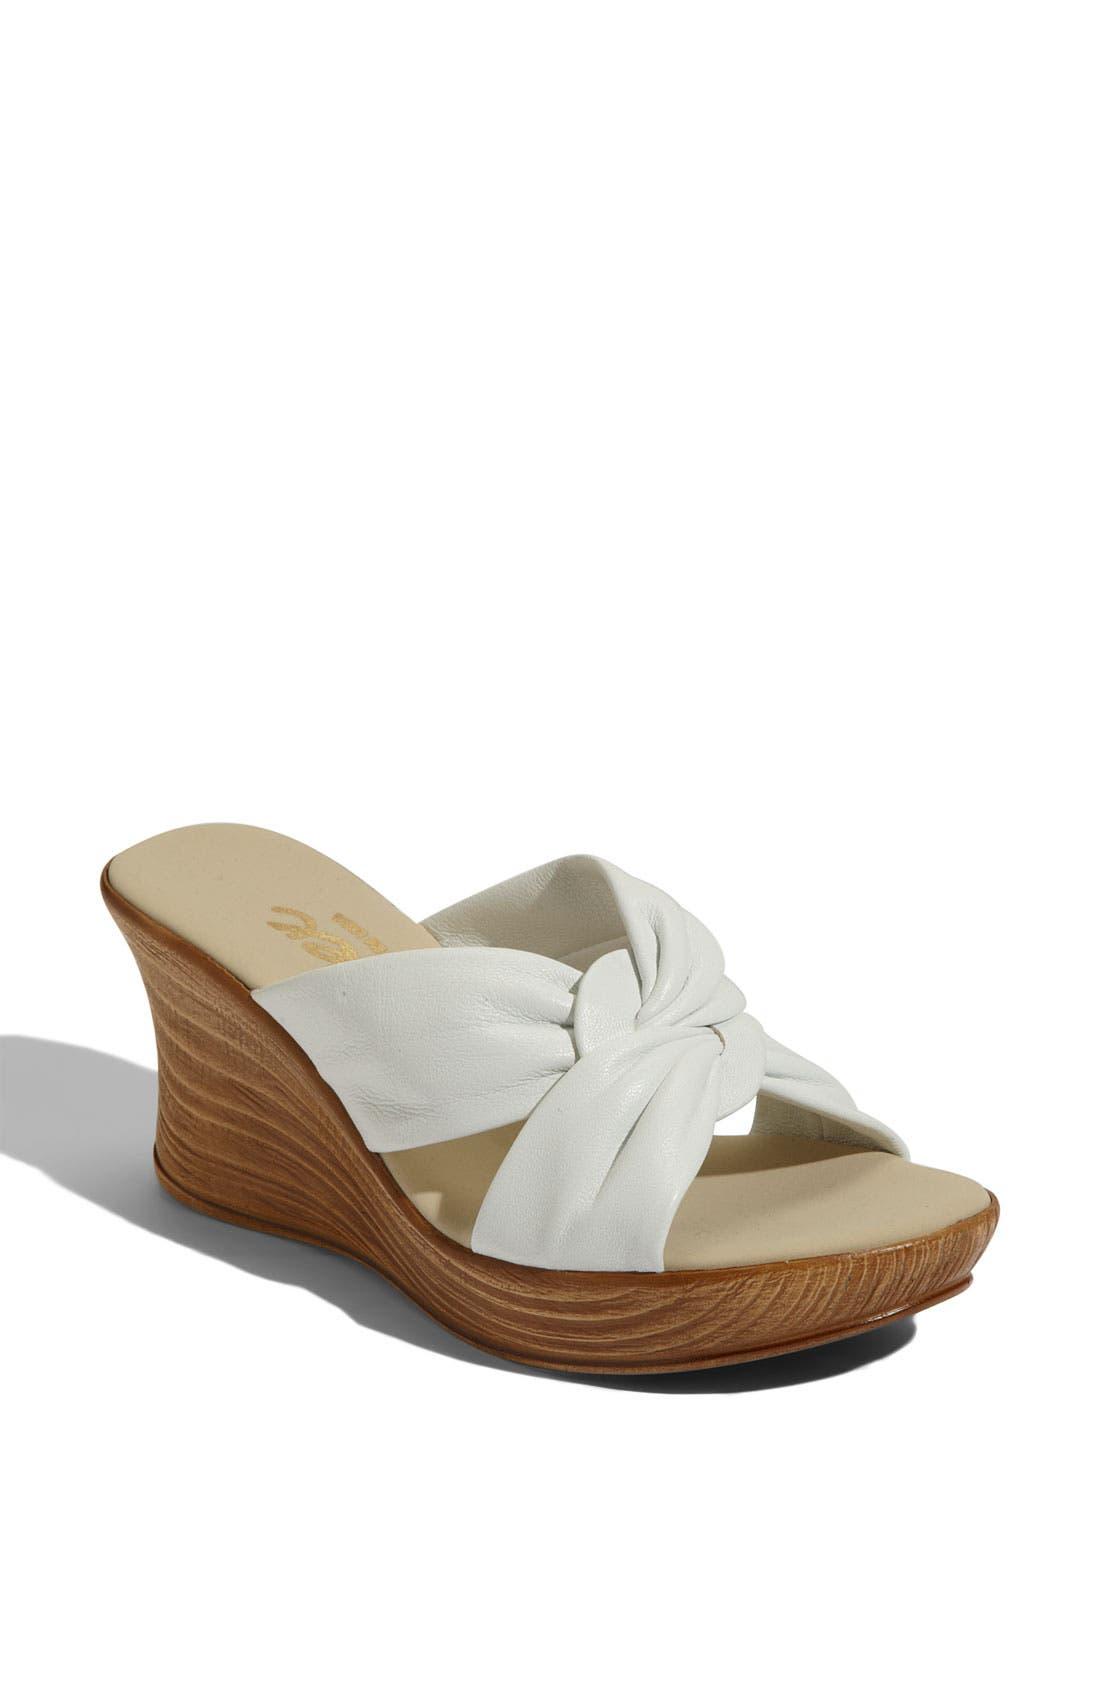 Main Image - Onex 'Puffy' Platform Sandal